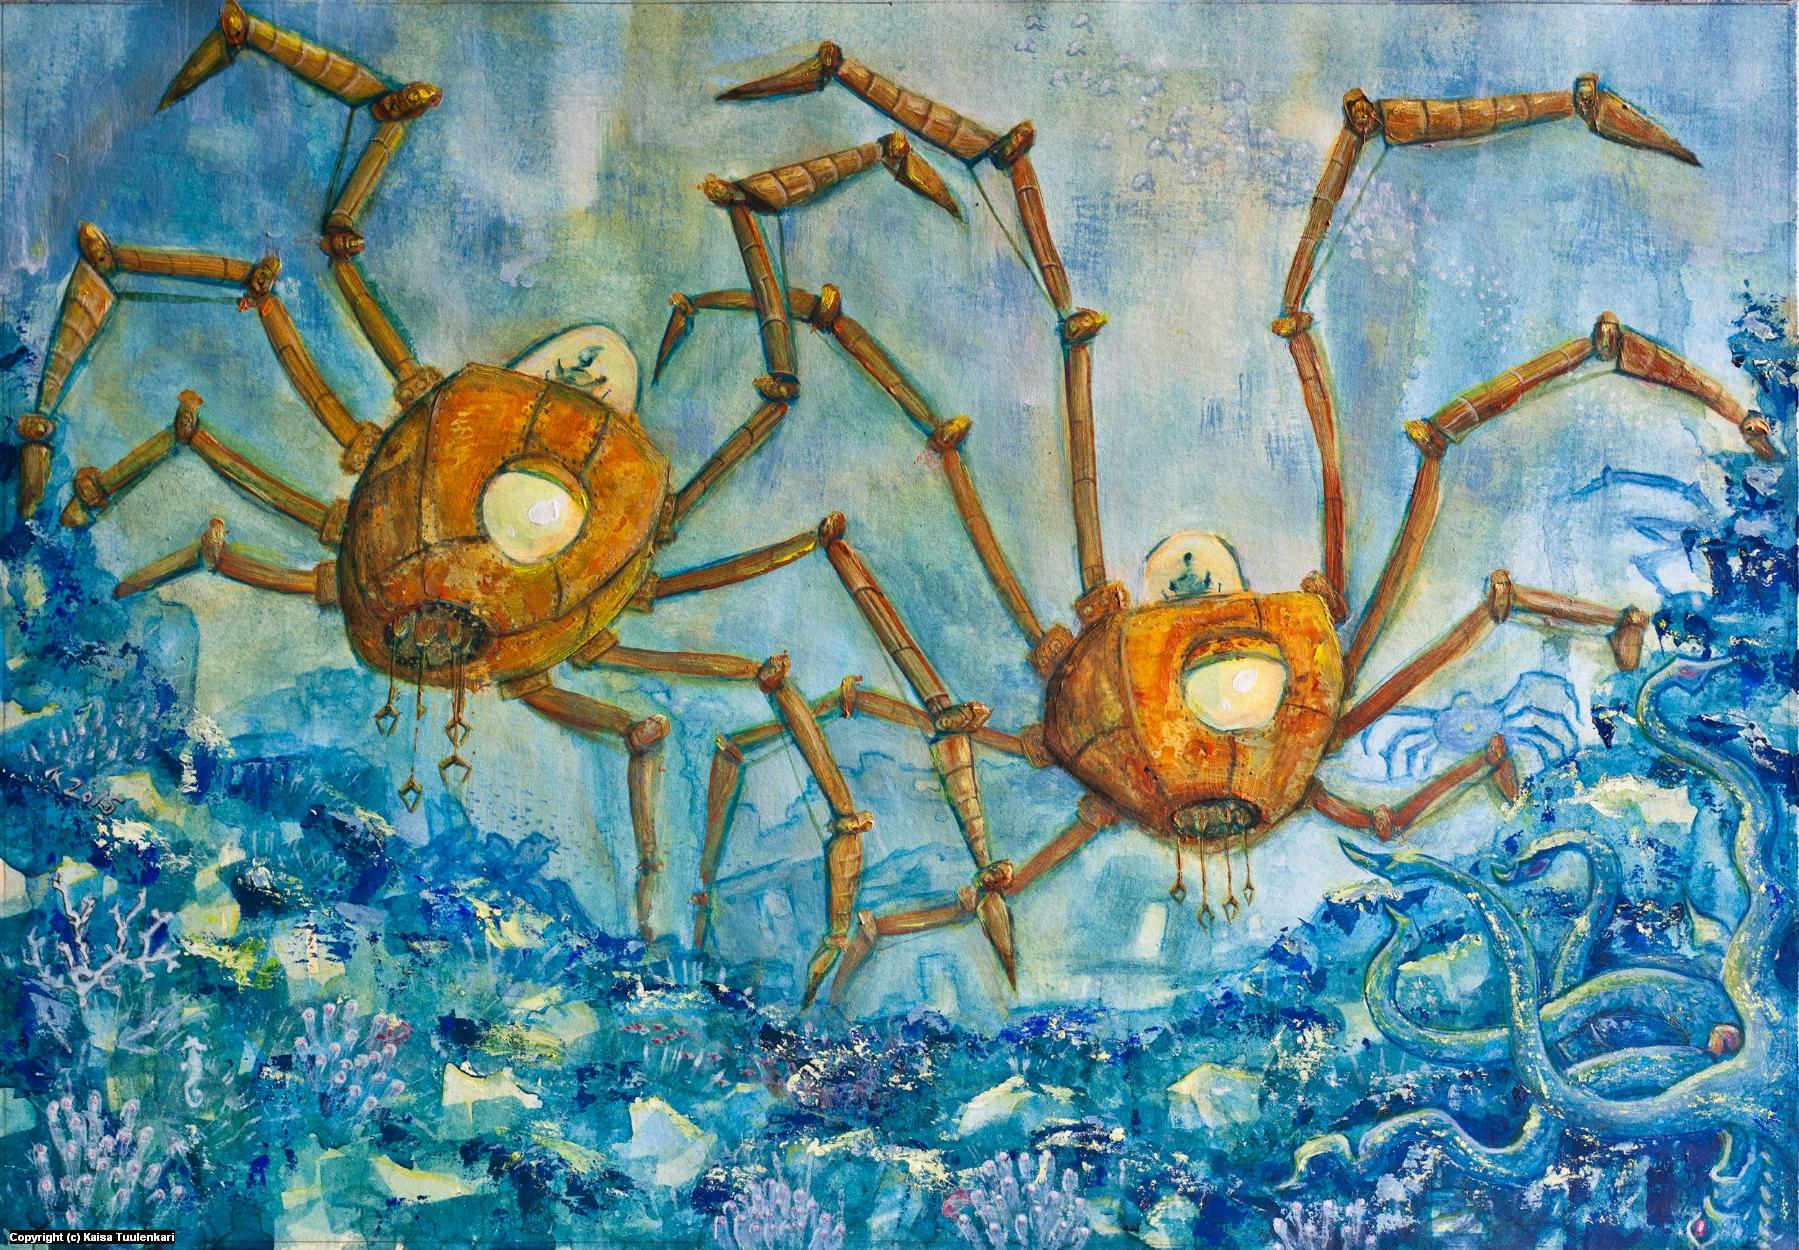 Deep Explorers Artwork by Kaisa Tuulenkari